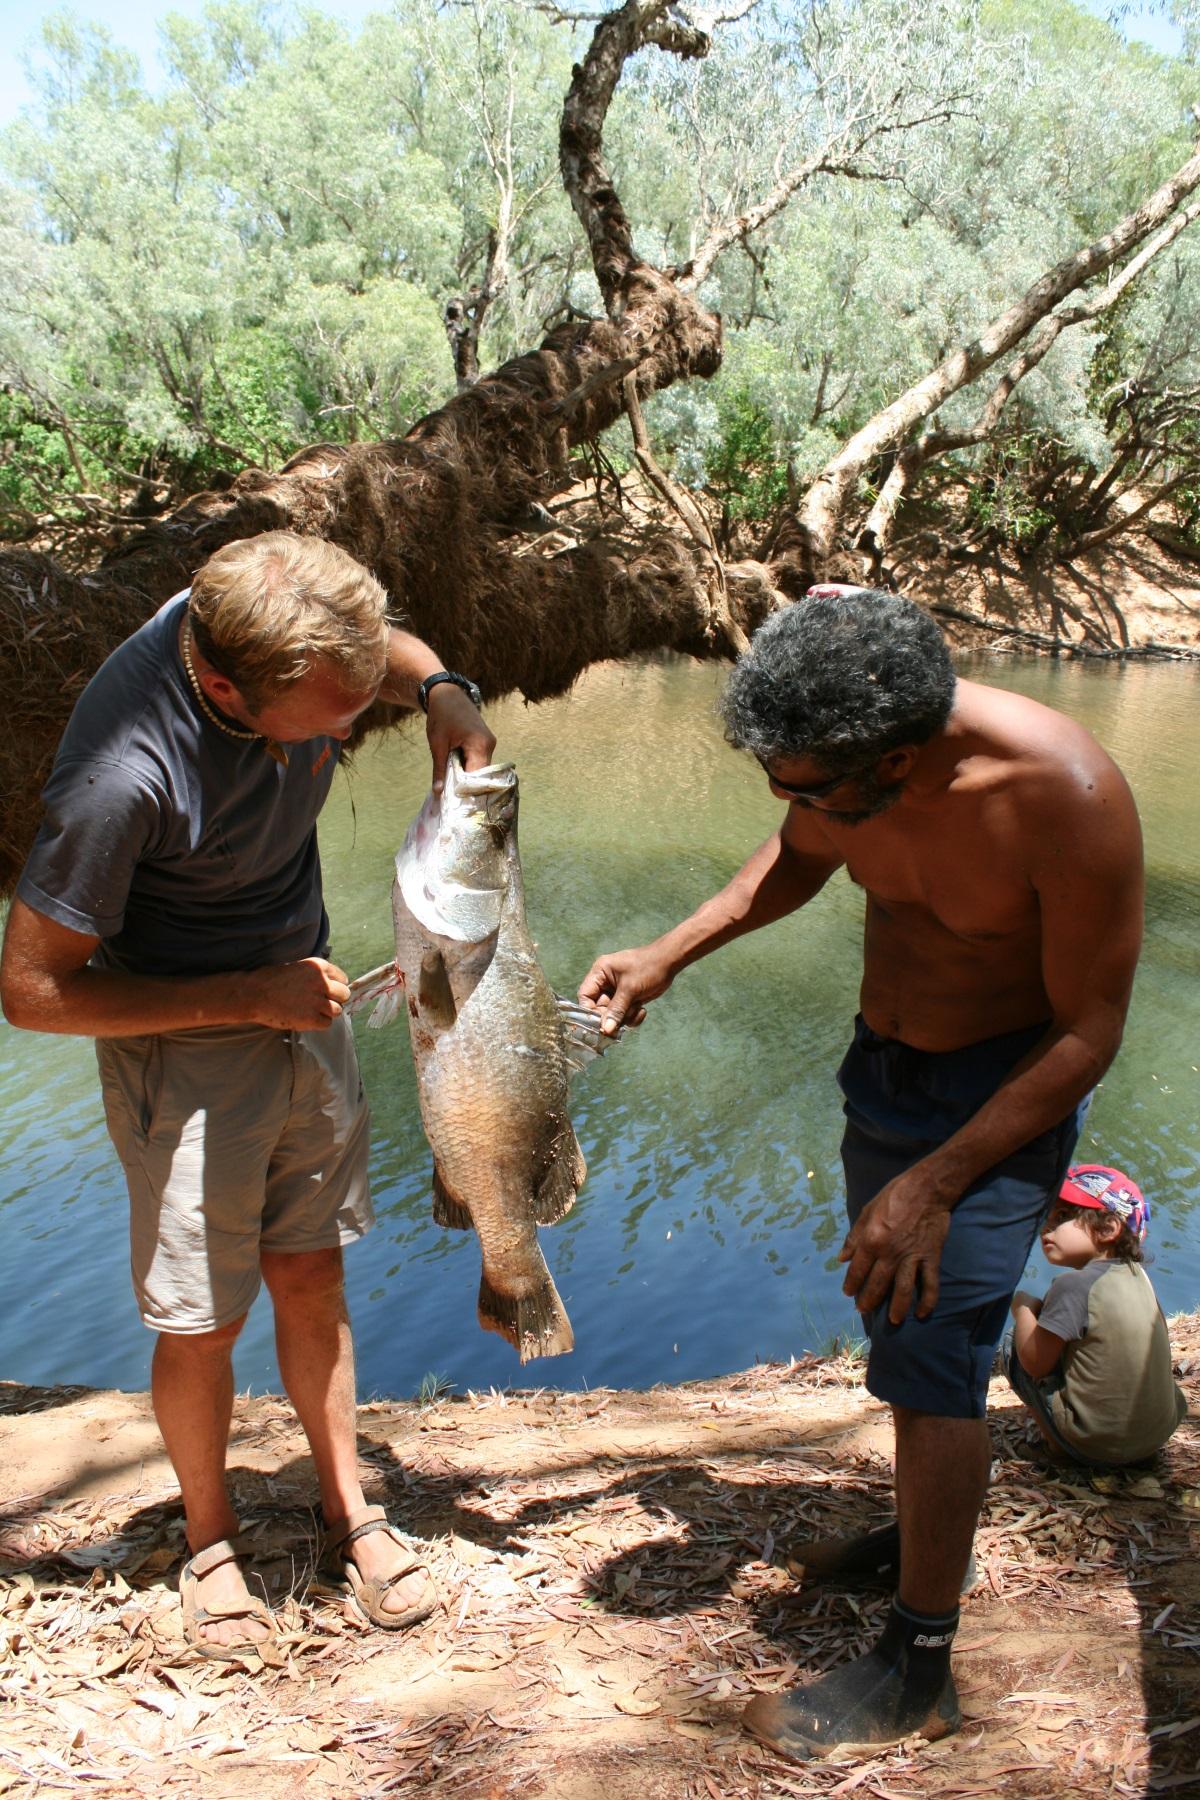 Fisch fangen, Aborigine